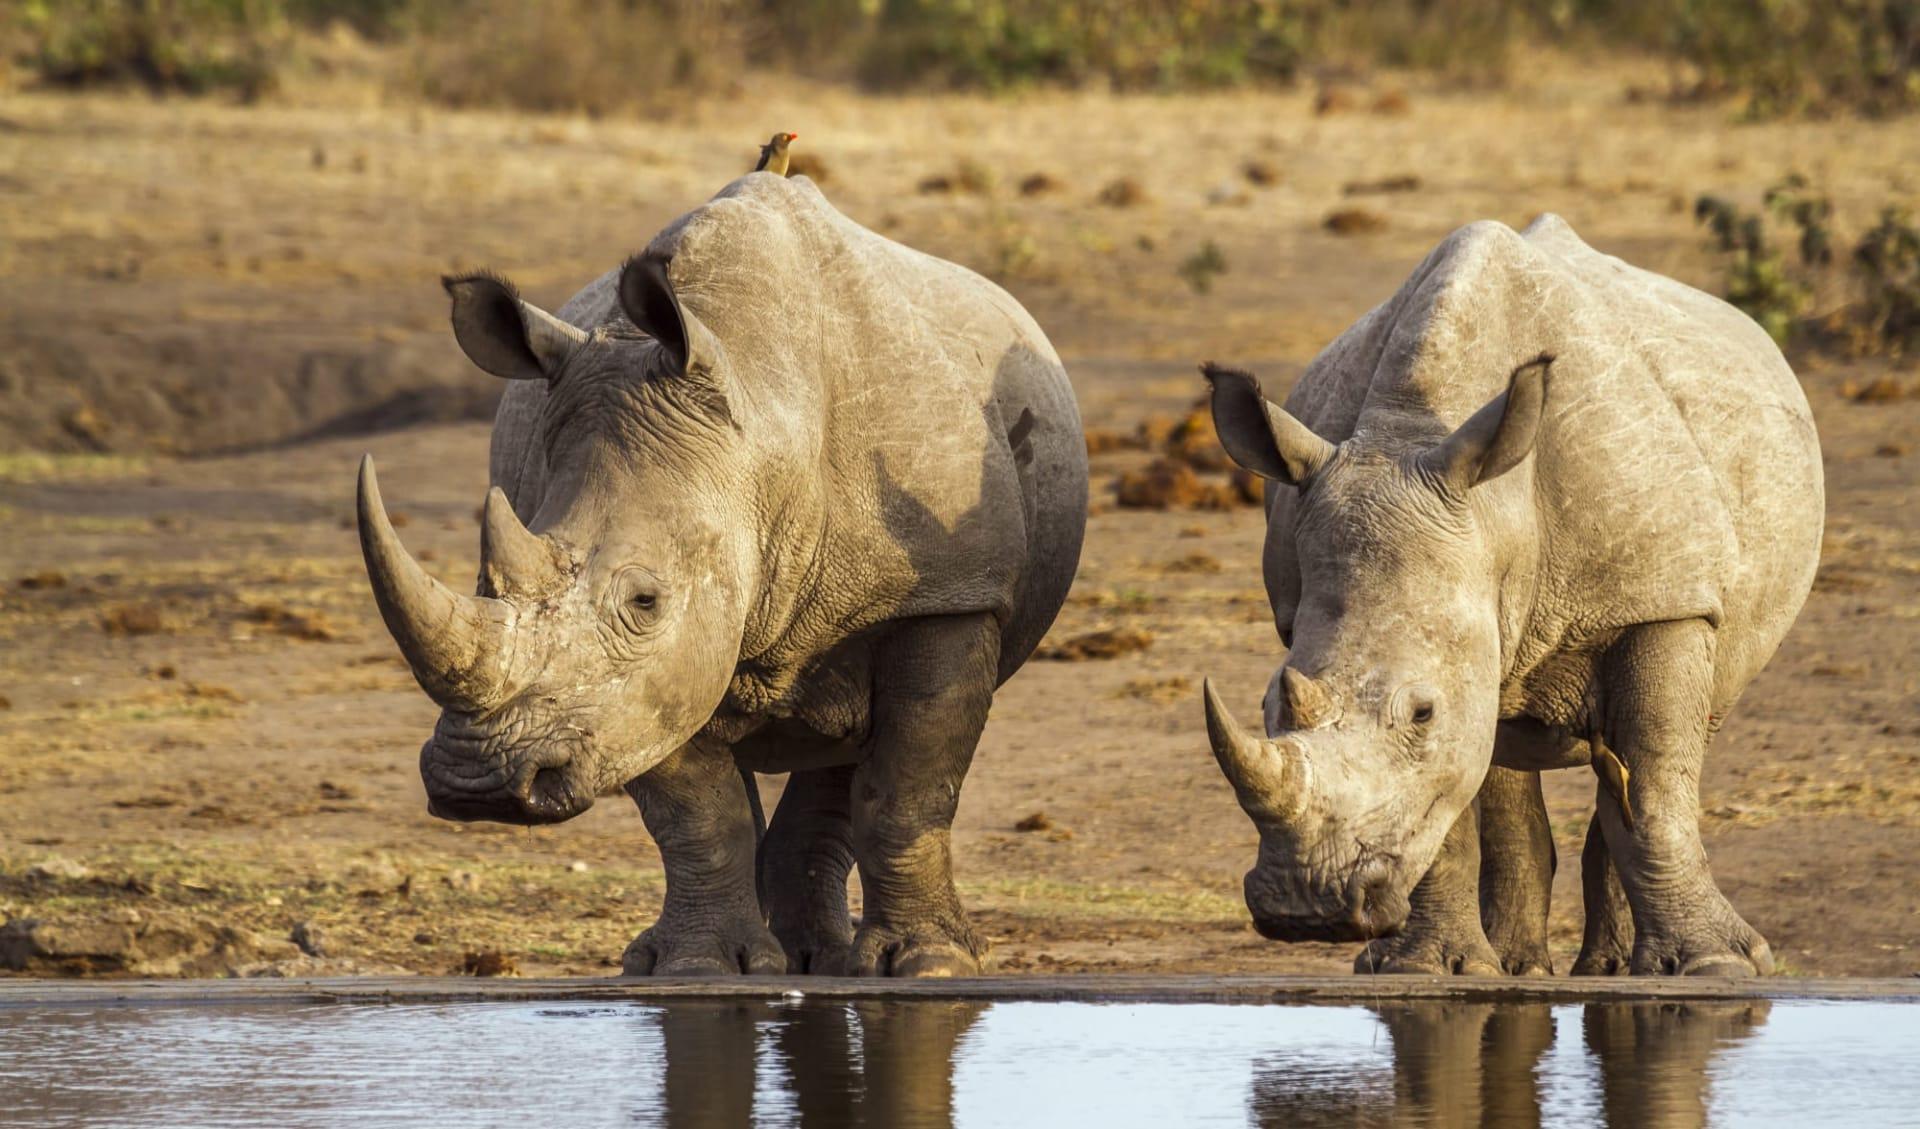 Best of South Africa ab Johannesburg: Südafrika - Krüger Nationalpark - Rhinos am trinken